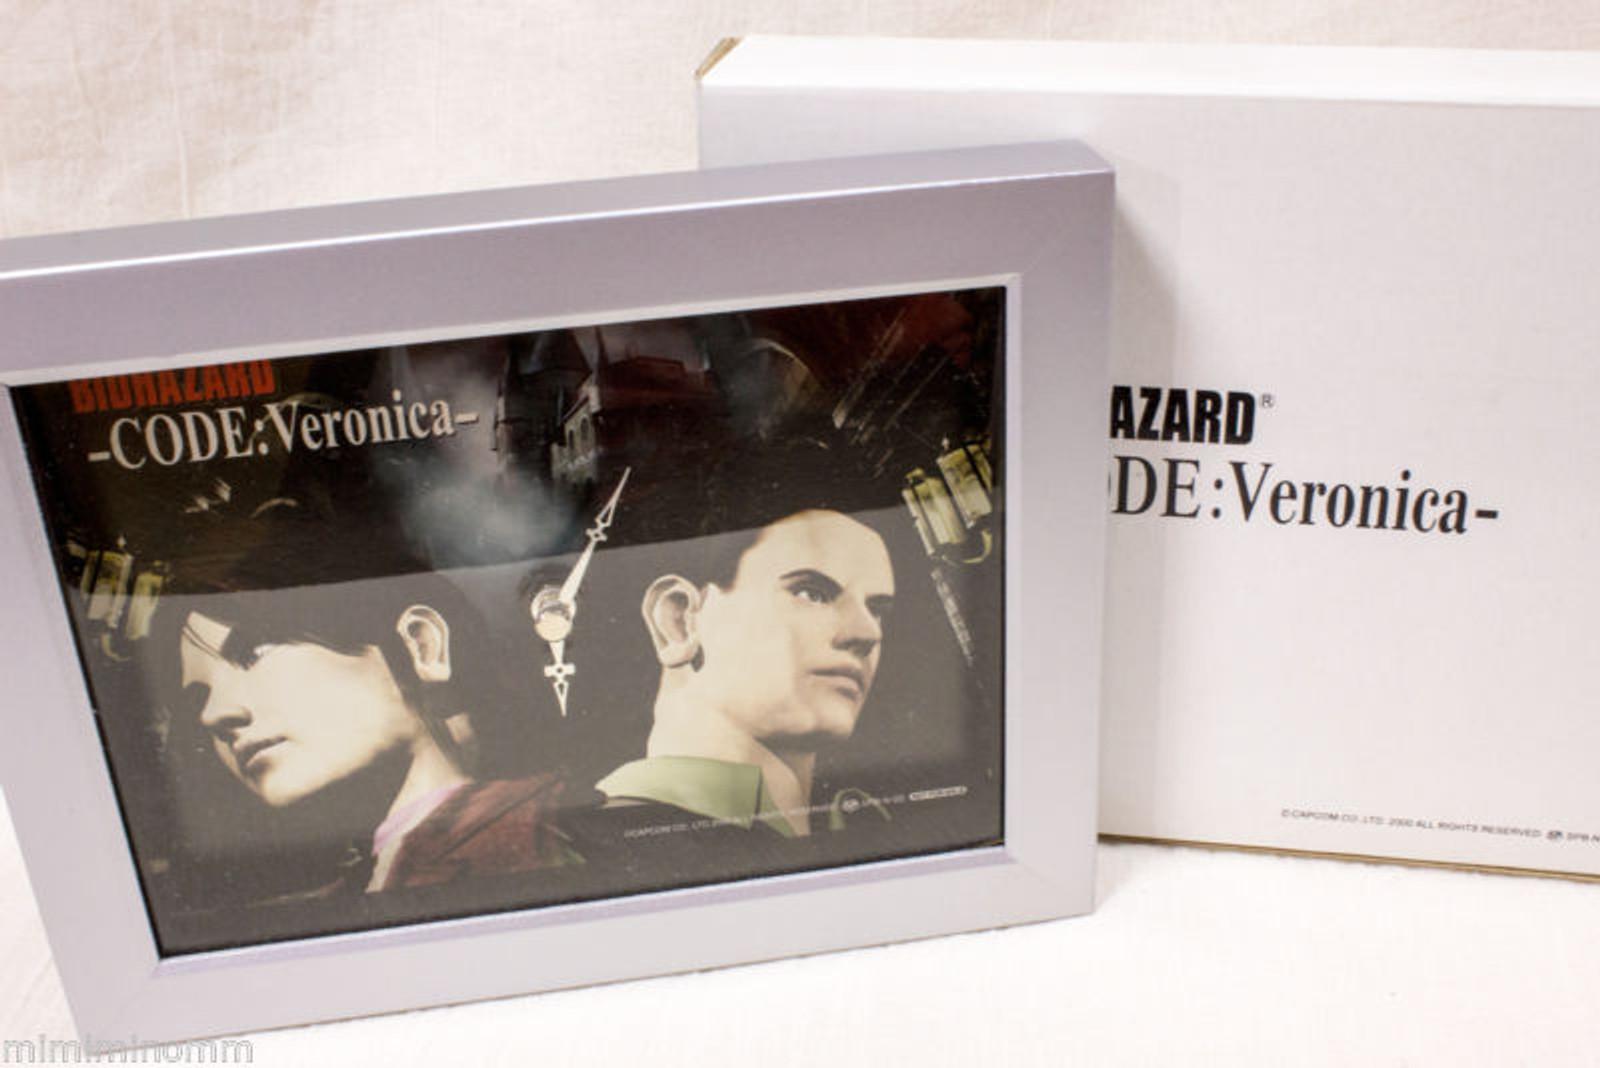 RARE! RESIDENT EVIL Biohazard Code:Veronica- Limited Picture Clock Capcom JAPAN